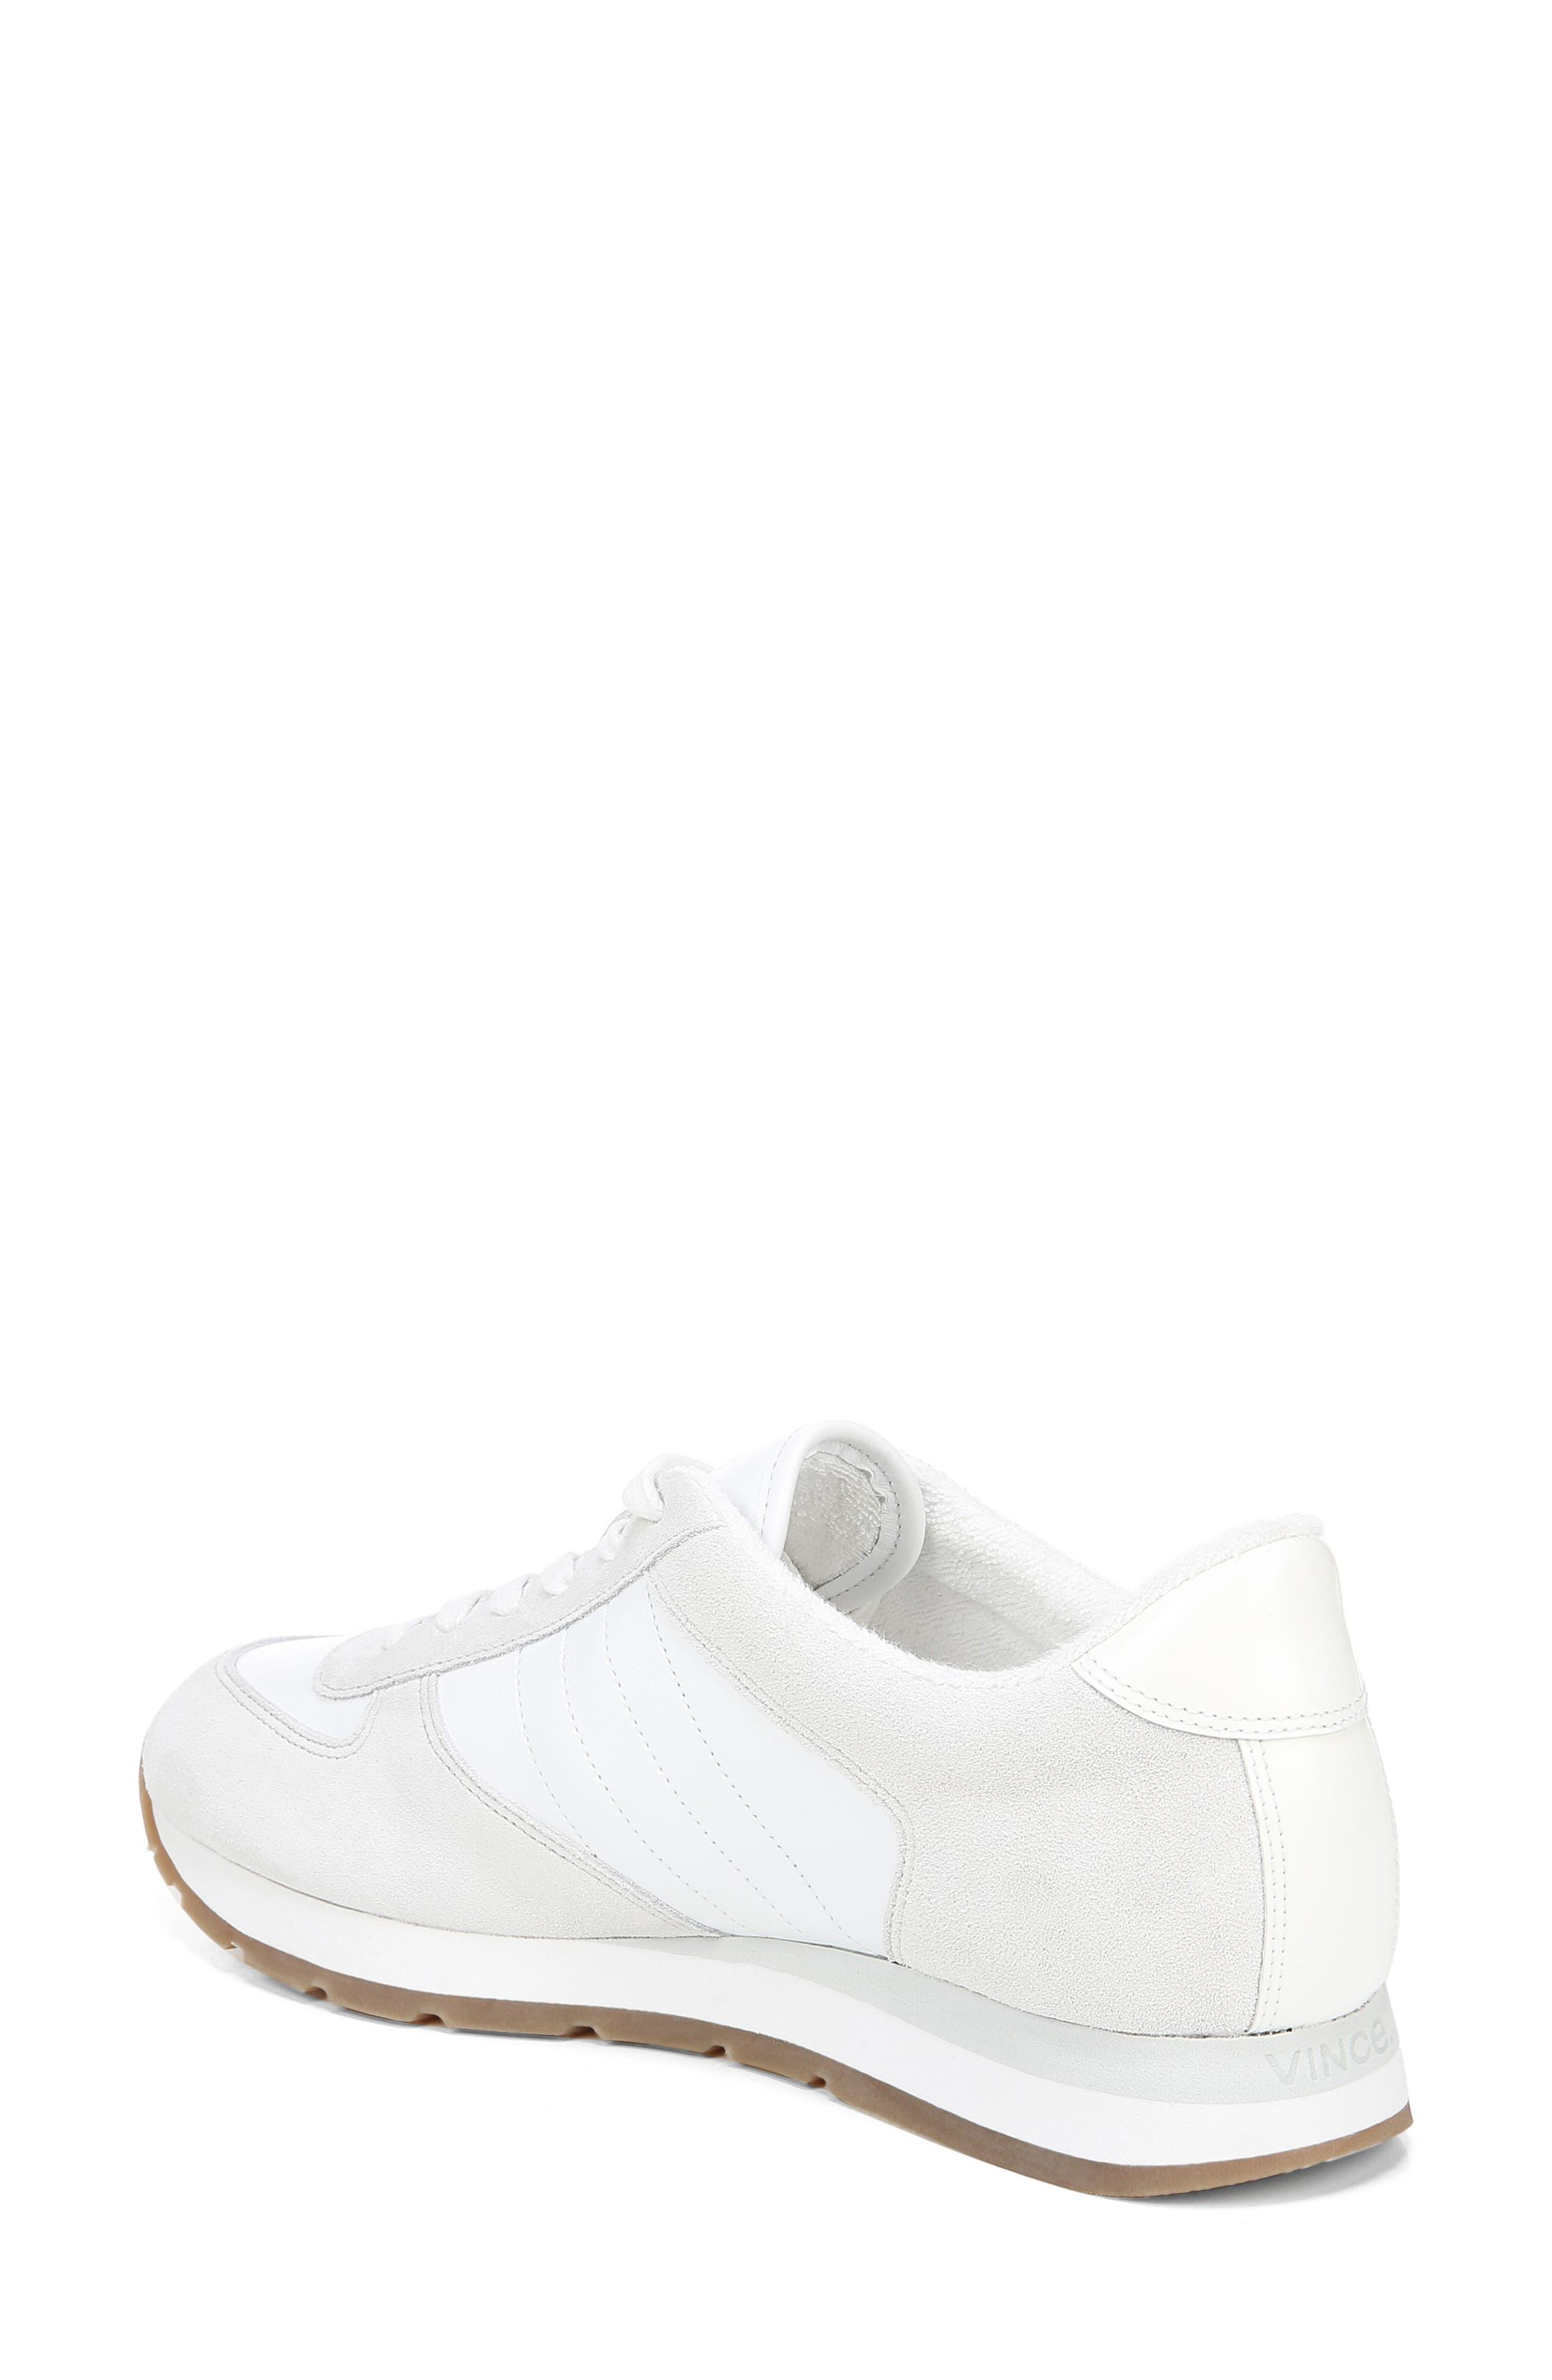 VINCE, Pasha Sneaker, Alternate thumbnail 2, color, WHITE